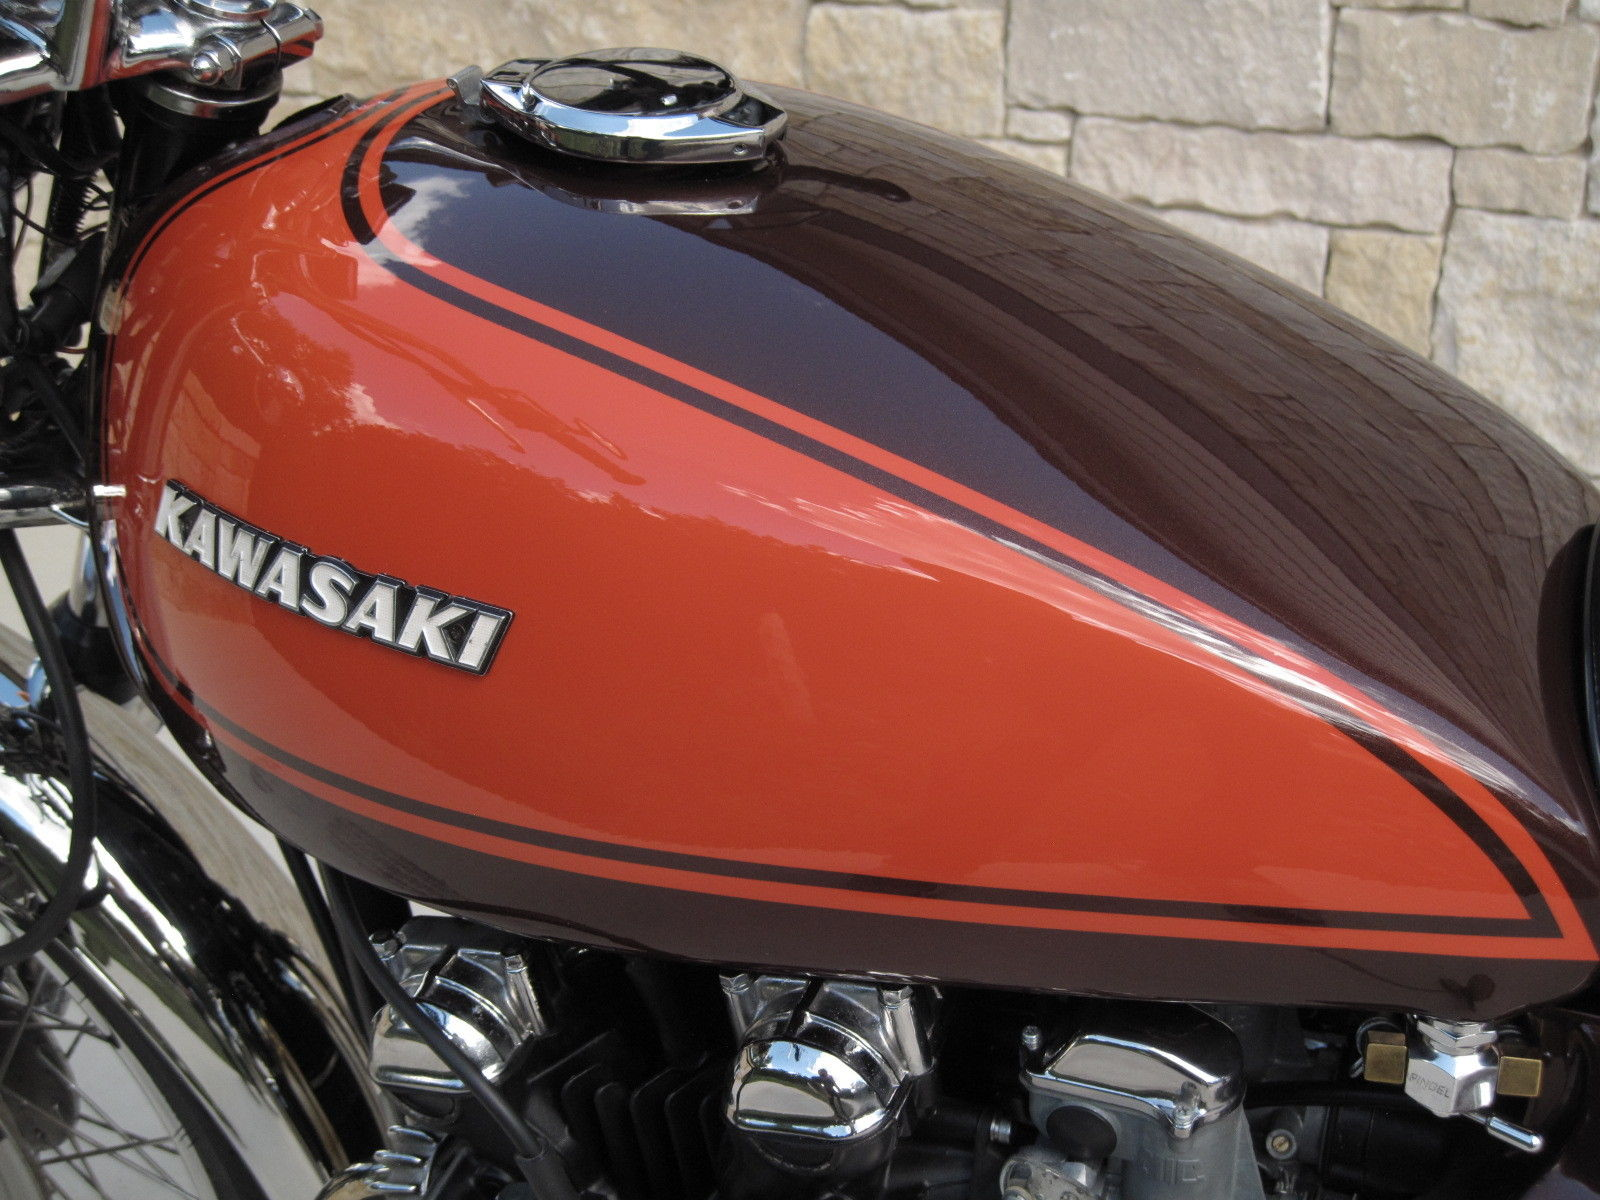 Kawasaki Z1 - 1973 - Fuel Tank, Cam Cover and Gas Cap.